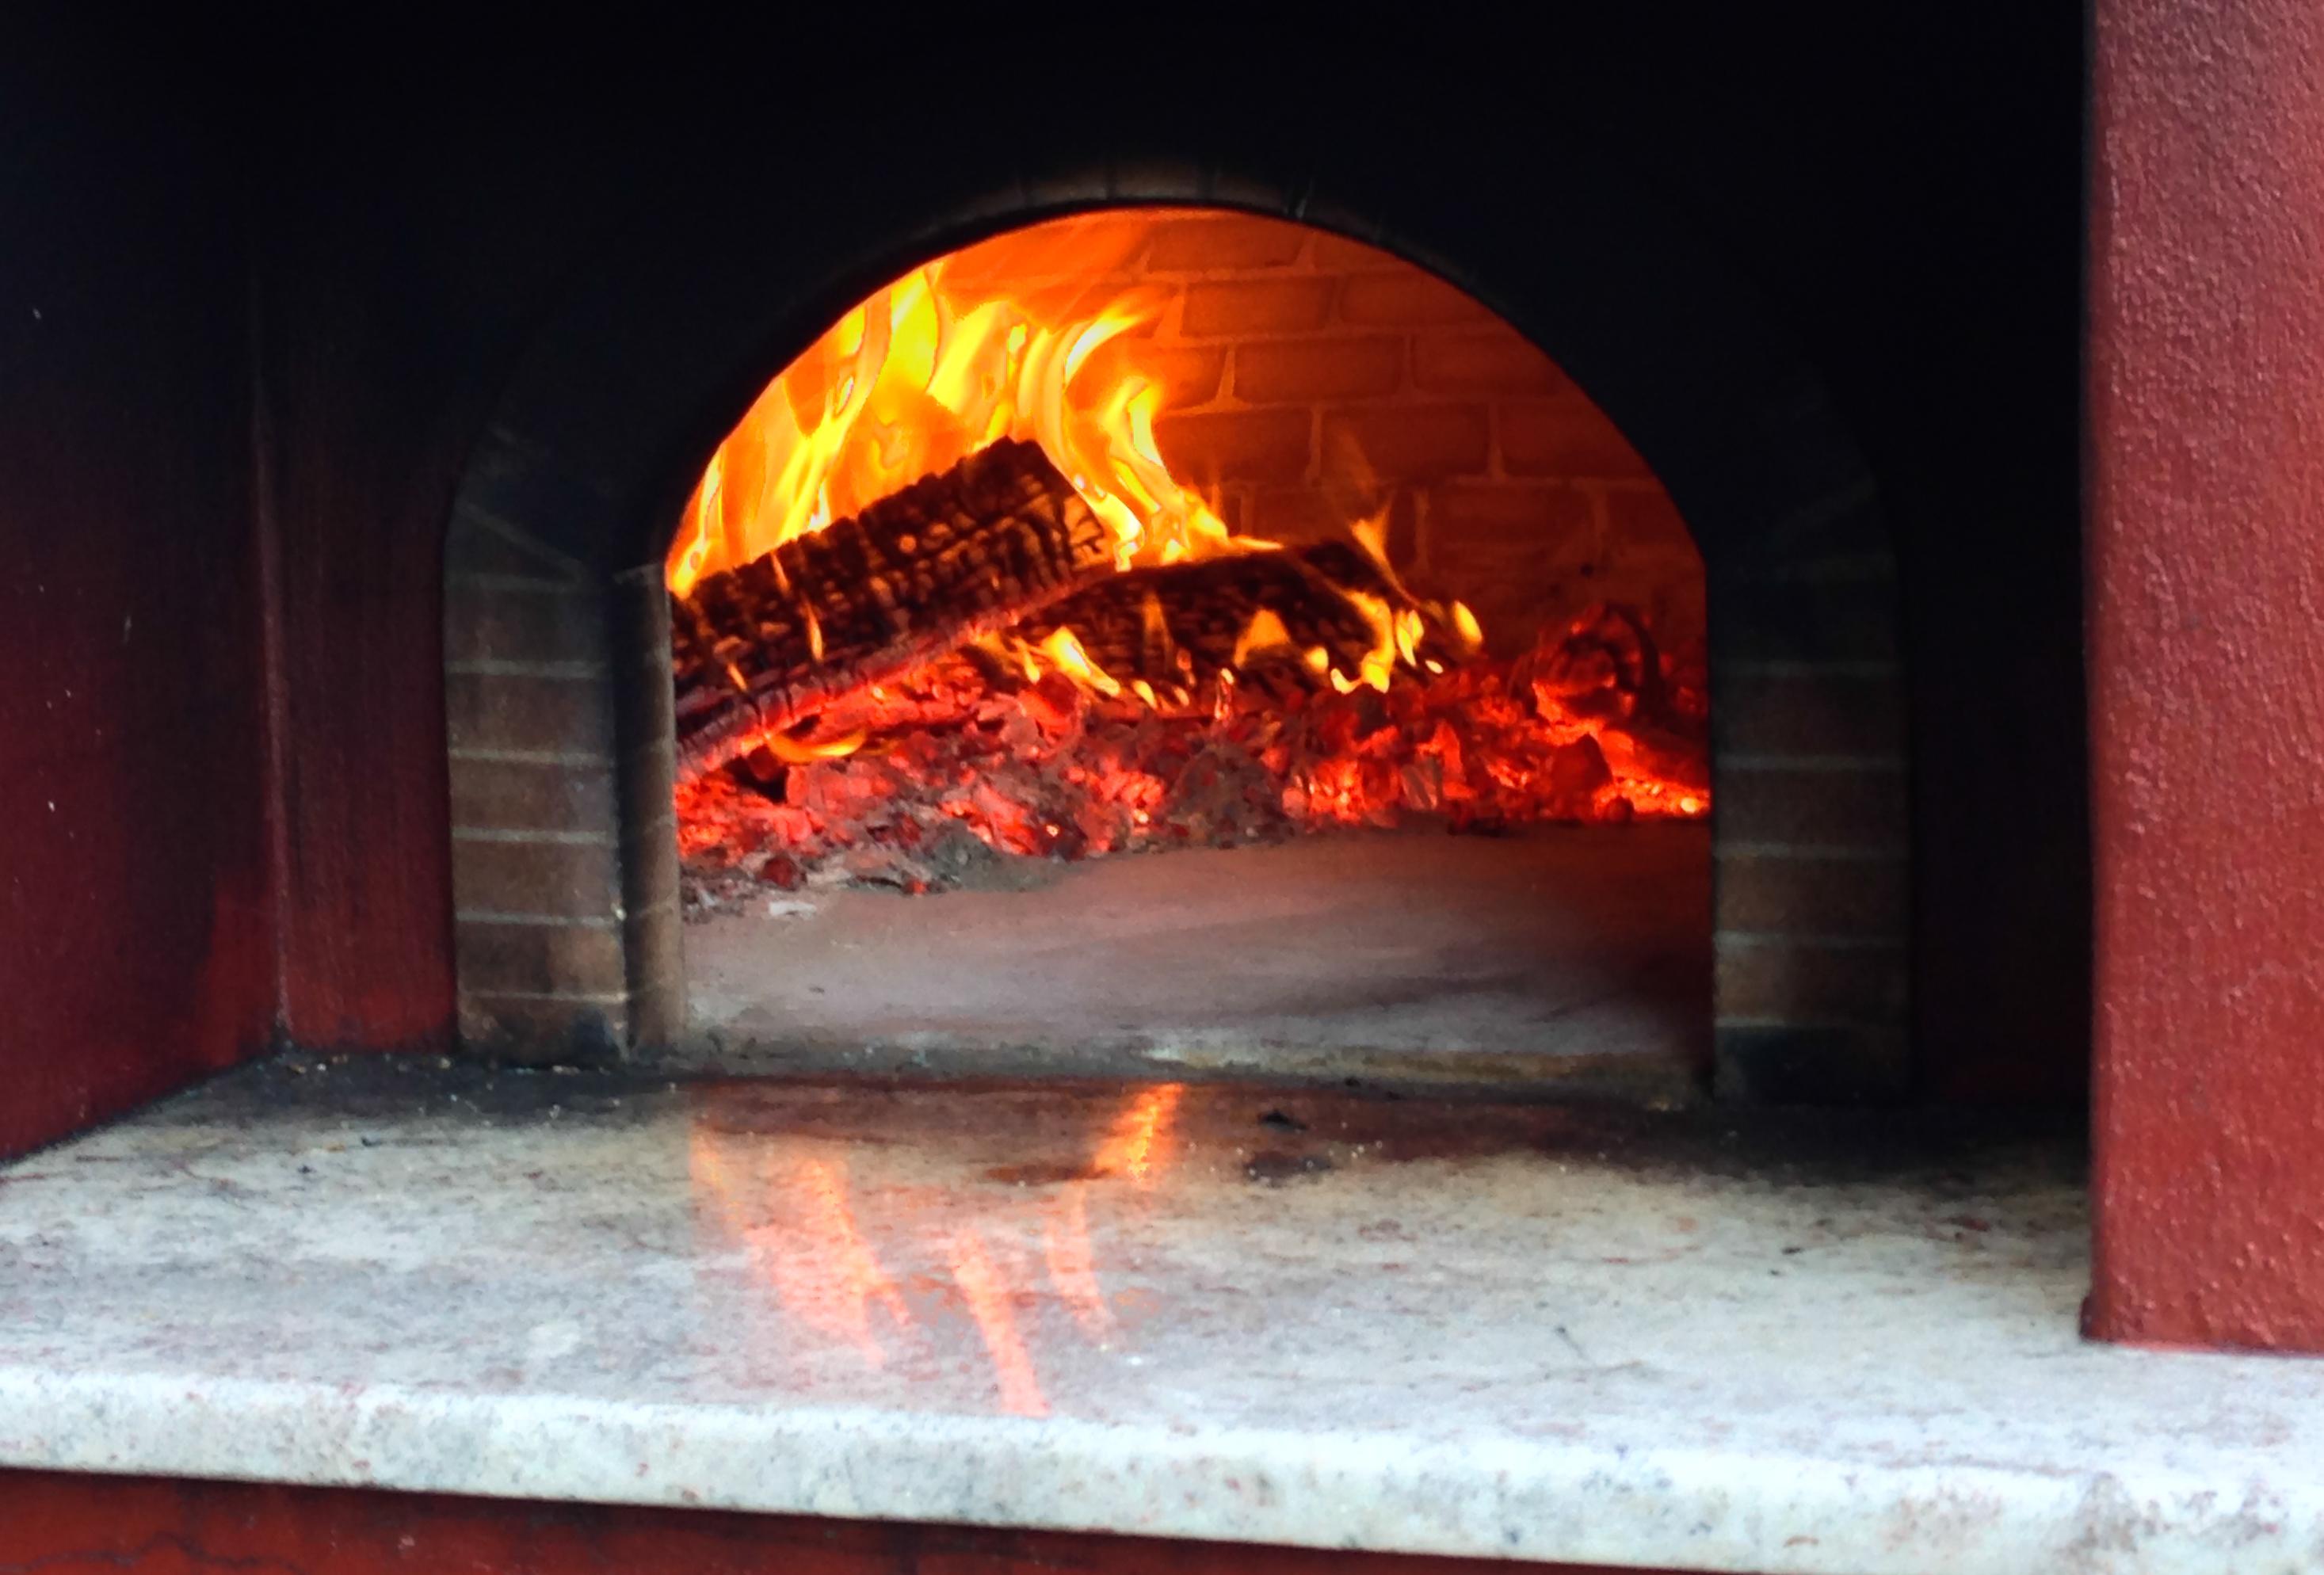 Ken Forkish Pizza Dough Dgourmac39s Blog